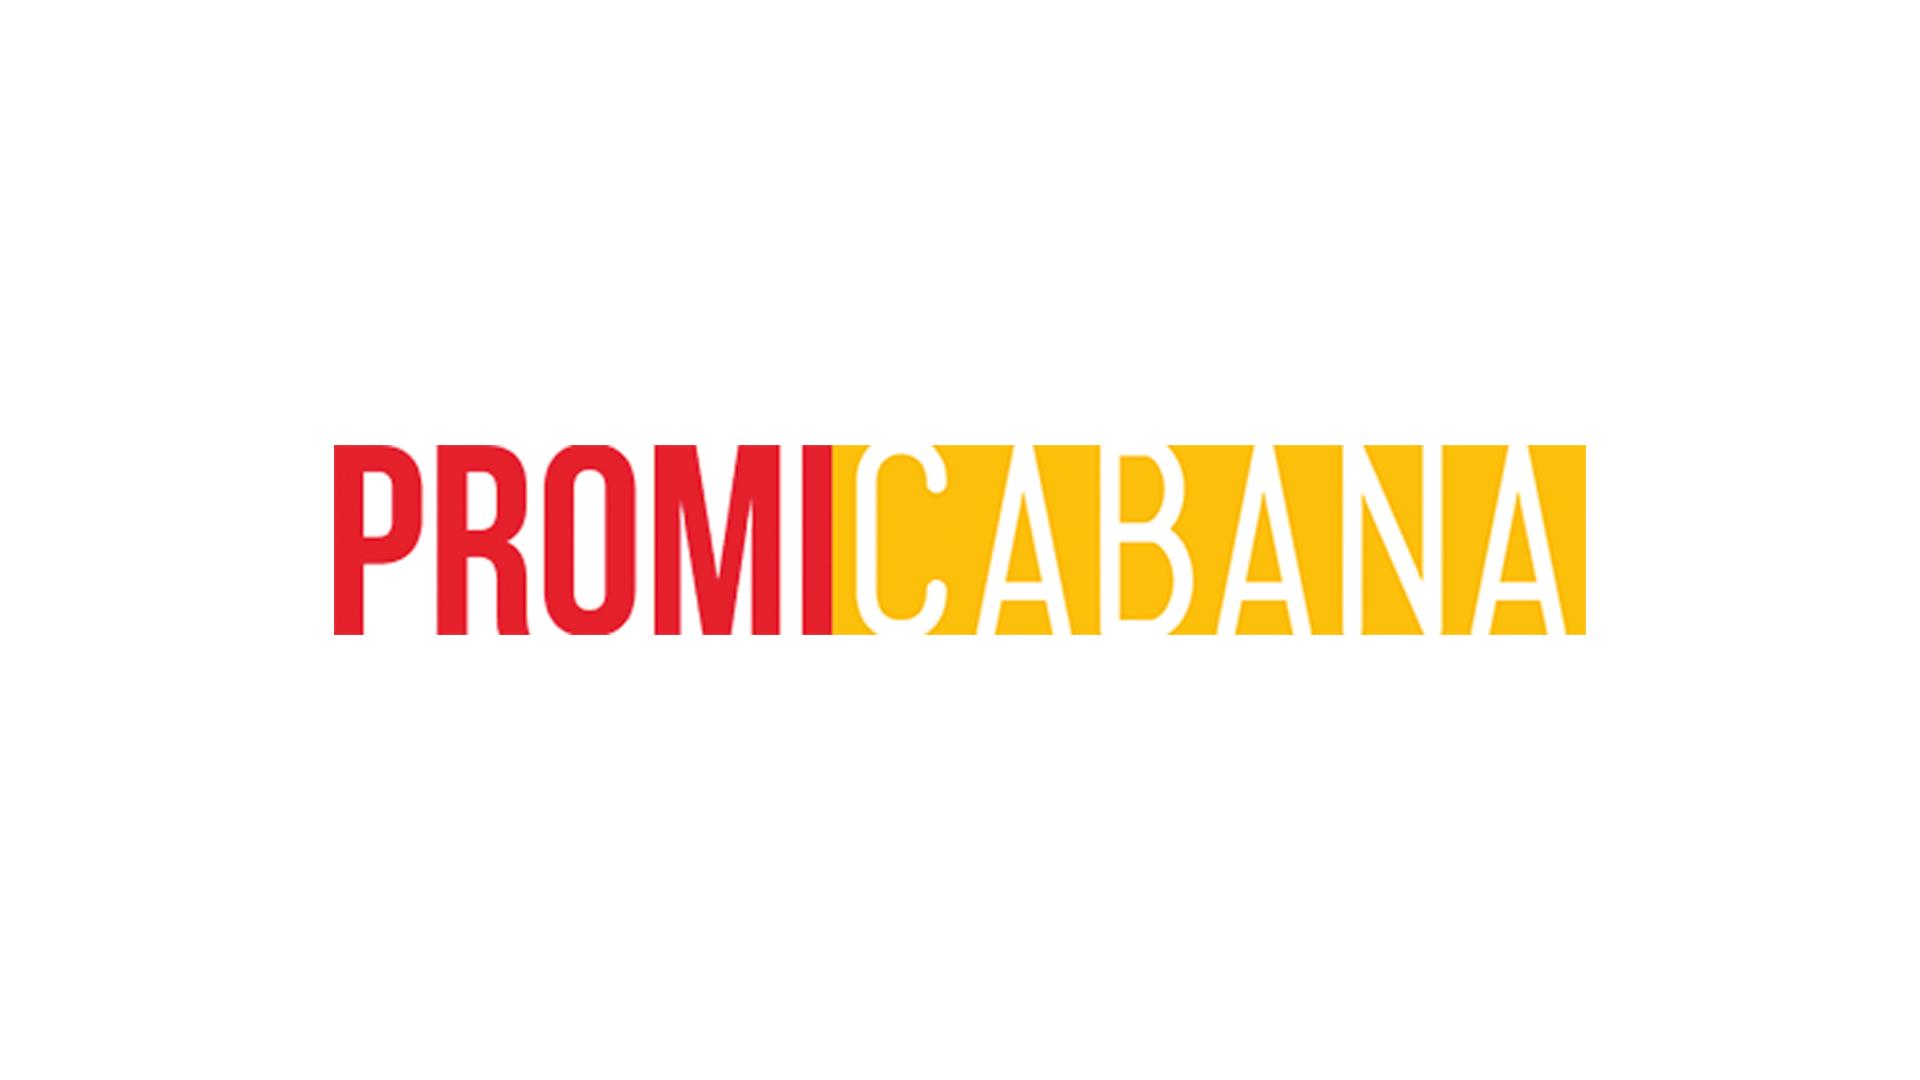 Justin-Bieber-Google-Chrome